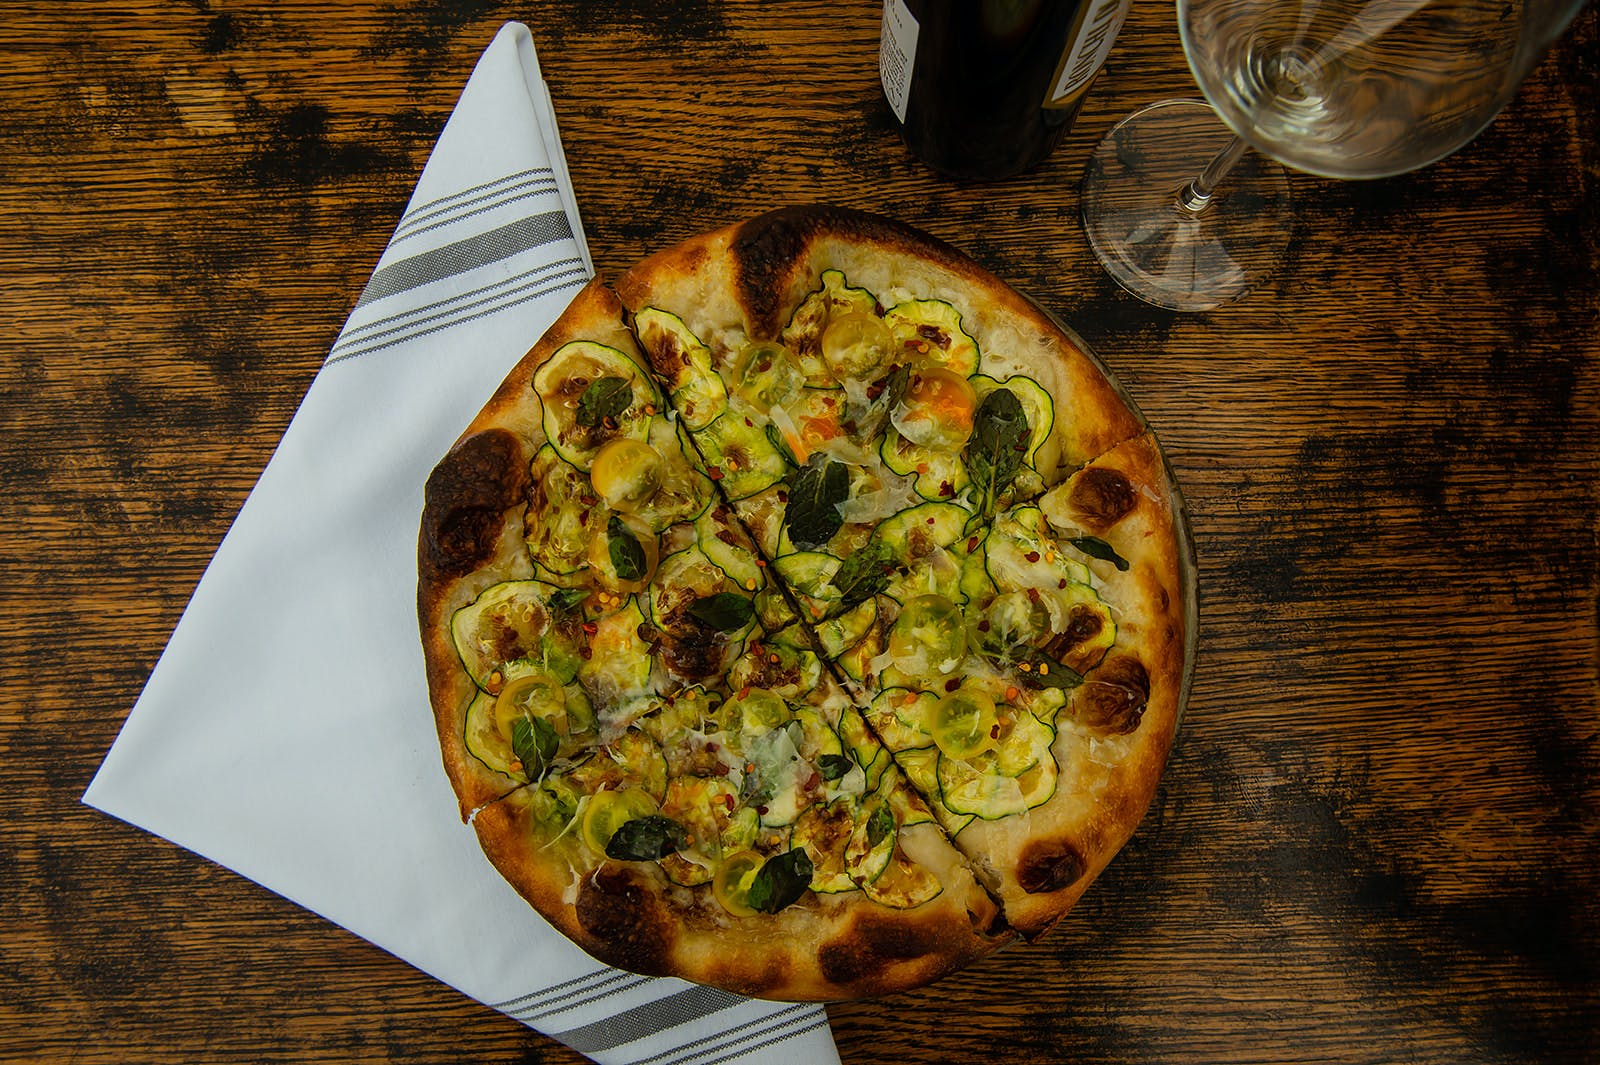 Pizza with Zucchini